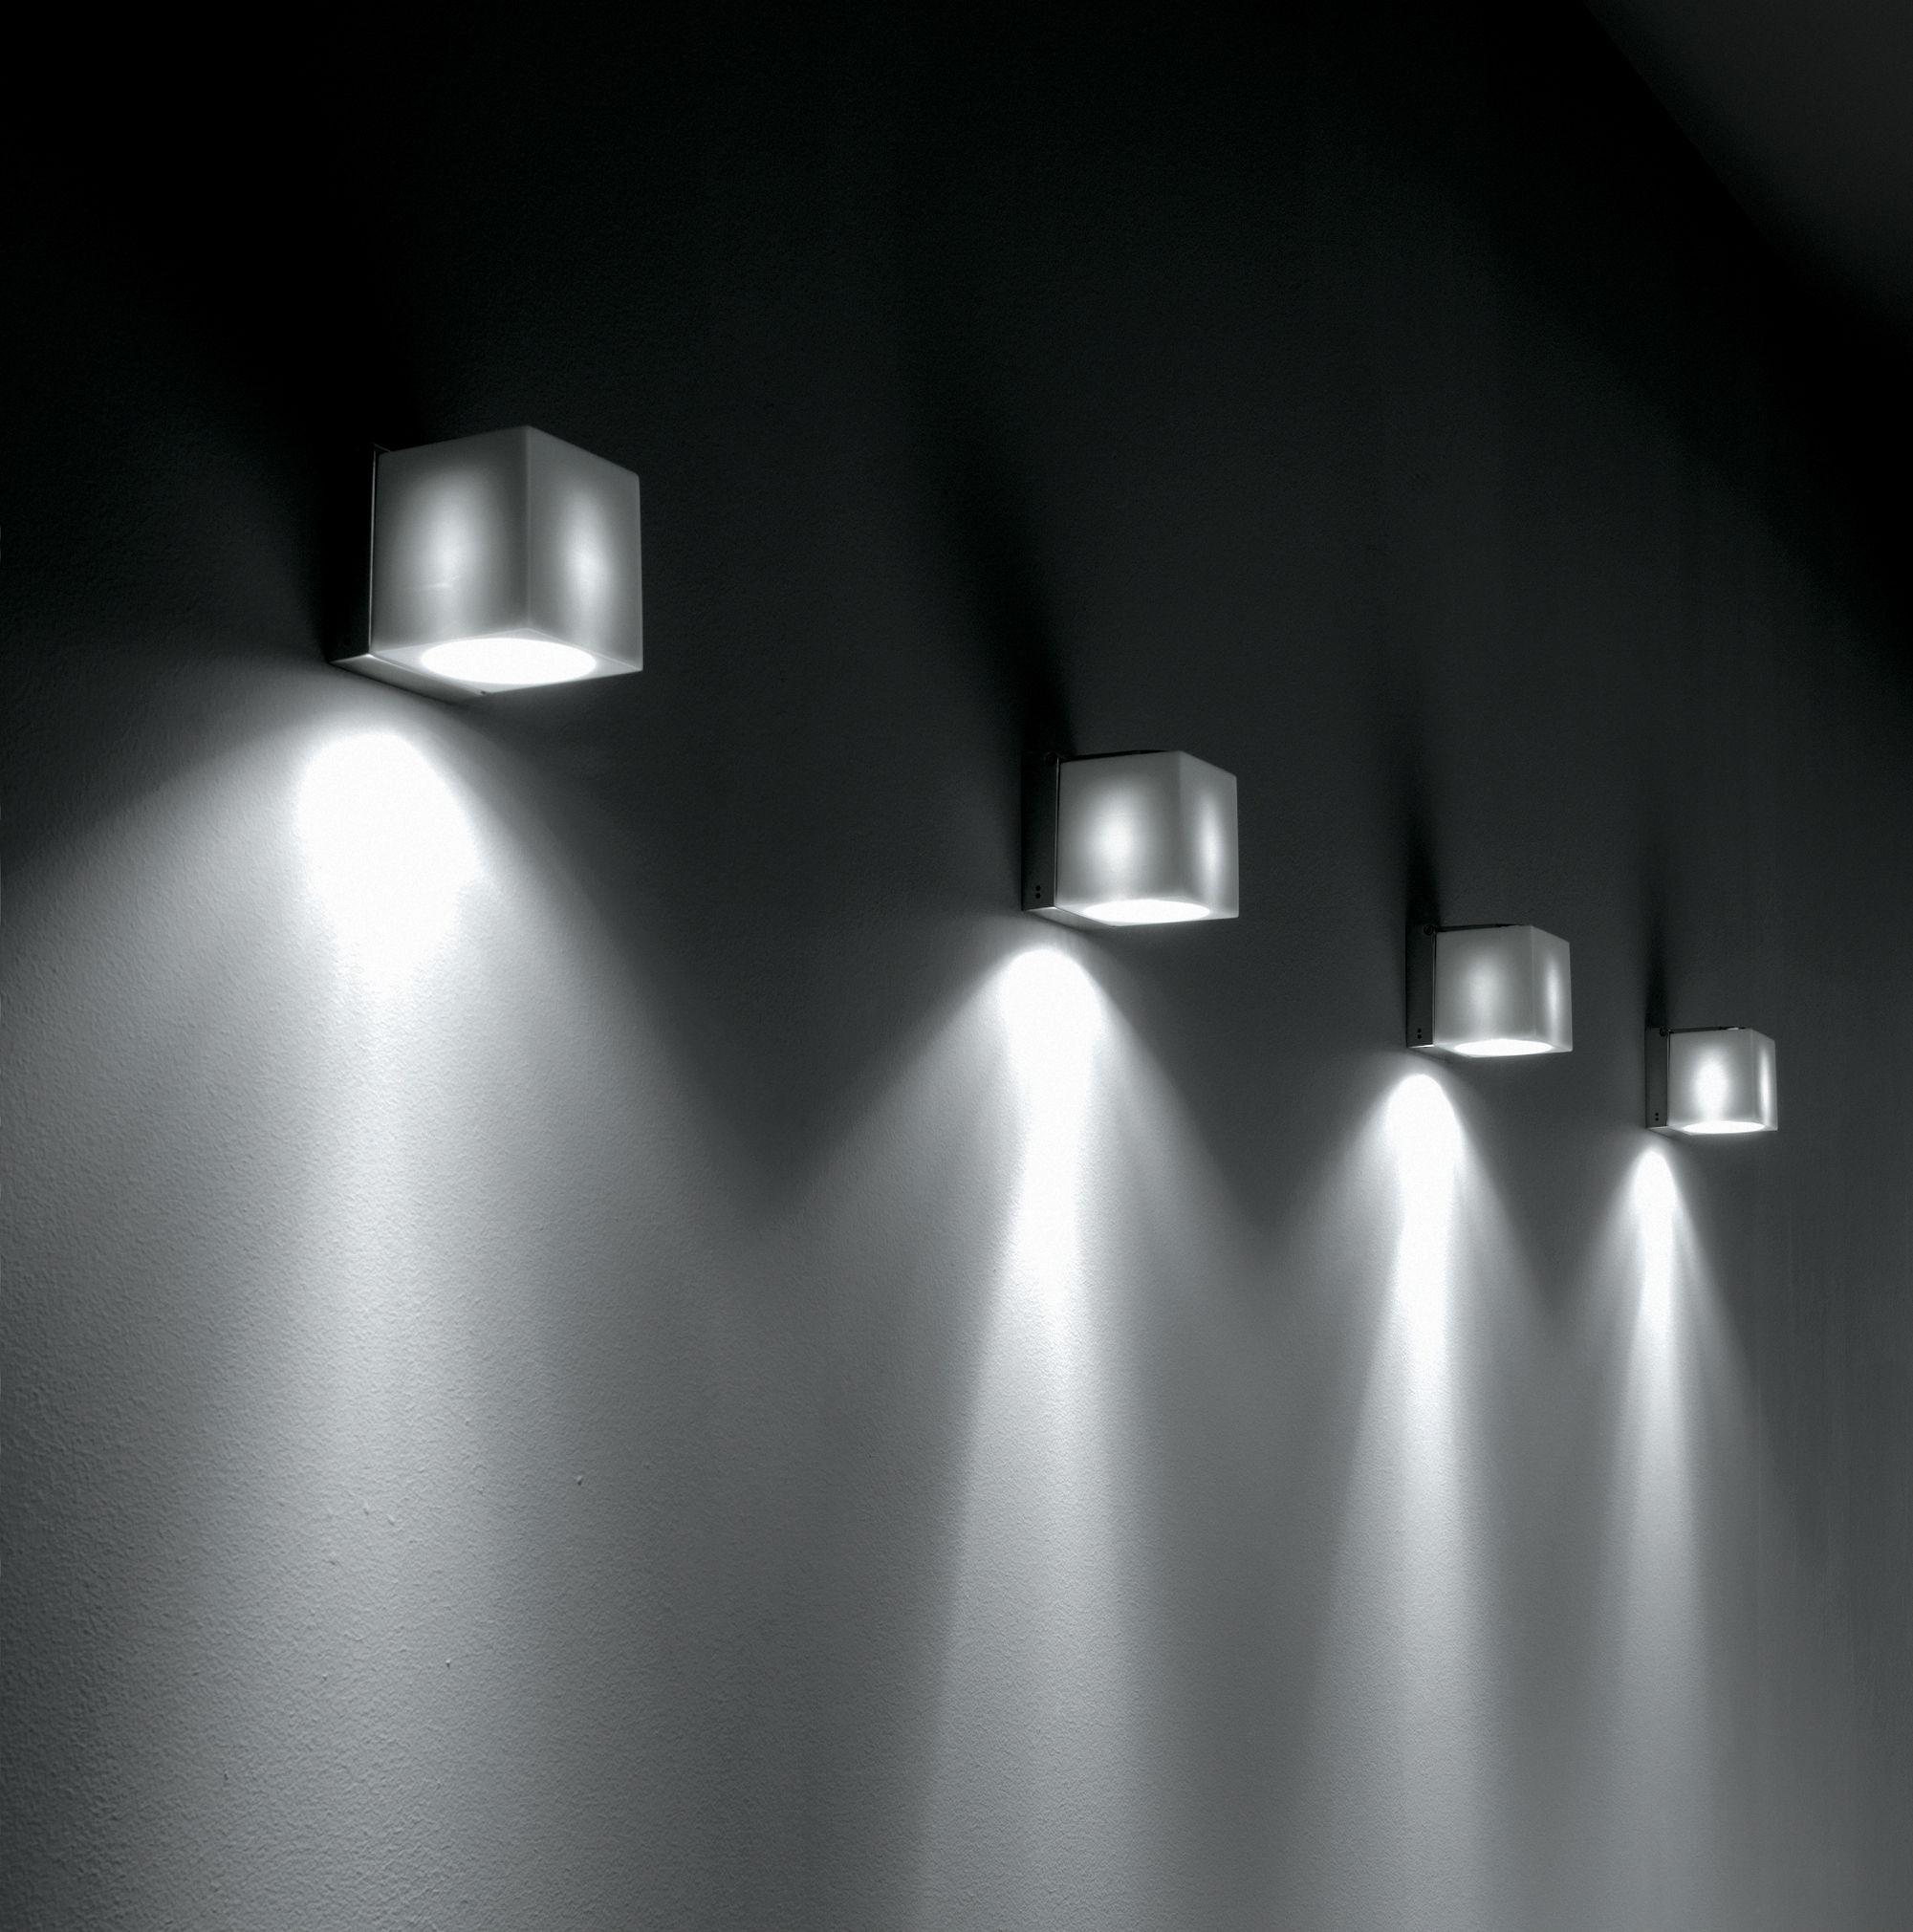 cubetto crystal deckenleuchte verstellbar fabbian wandleuchte. Black Bedroom Furniture Sets. Home Design Ideas